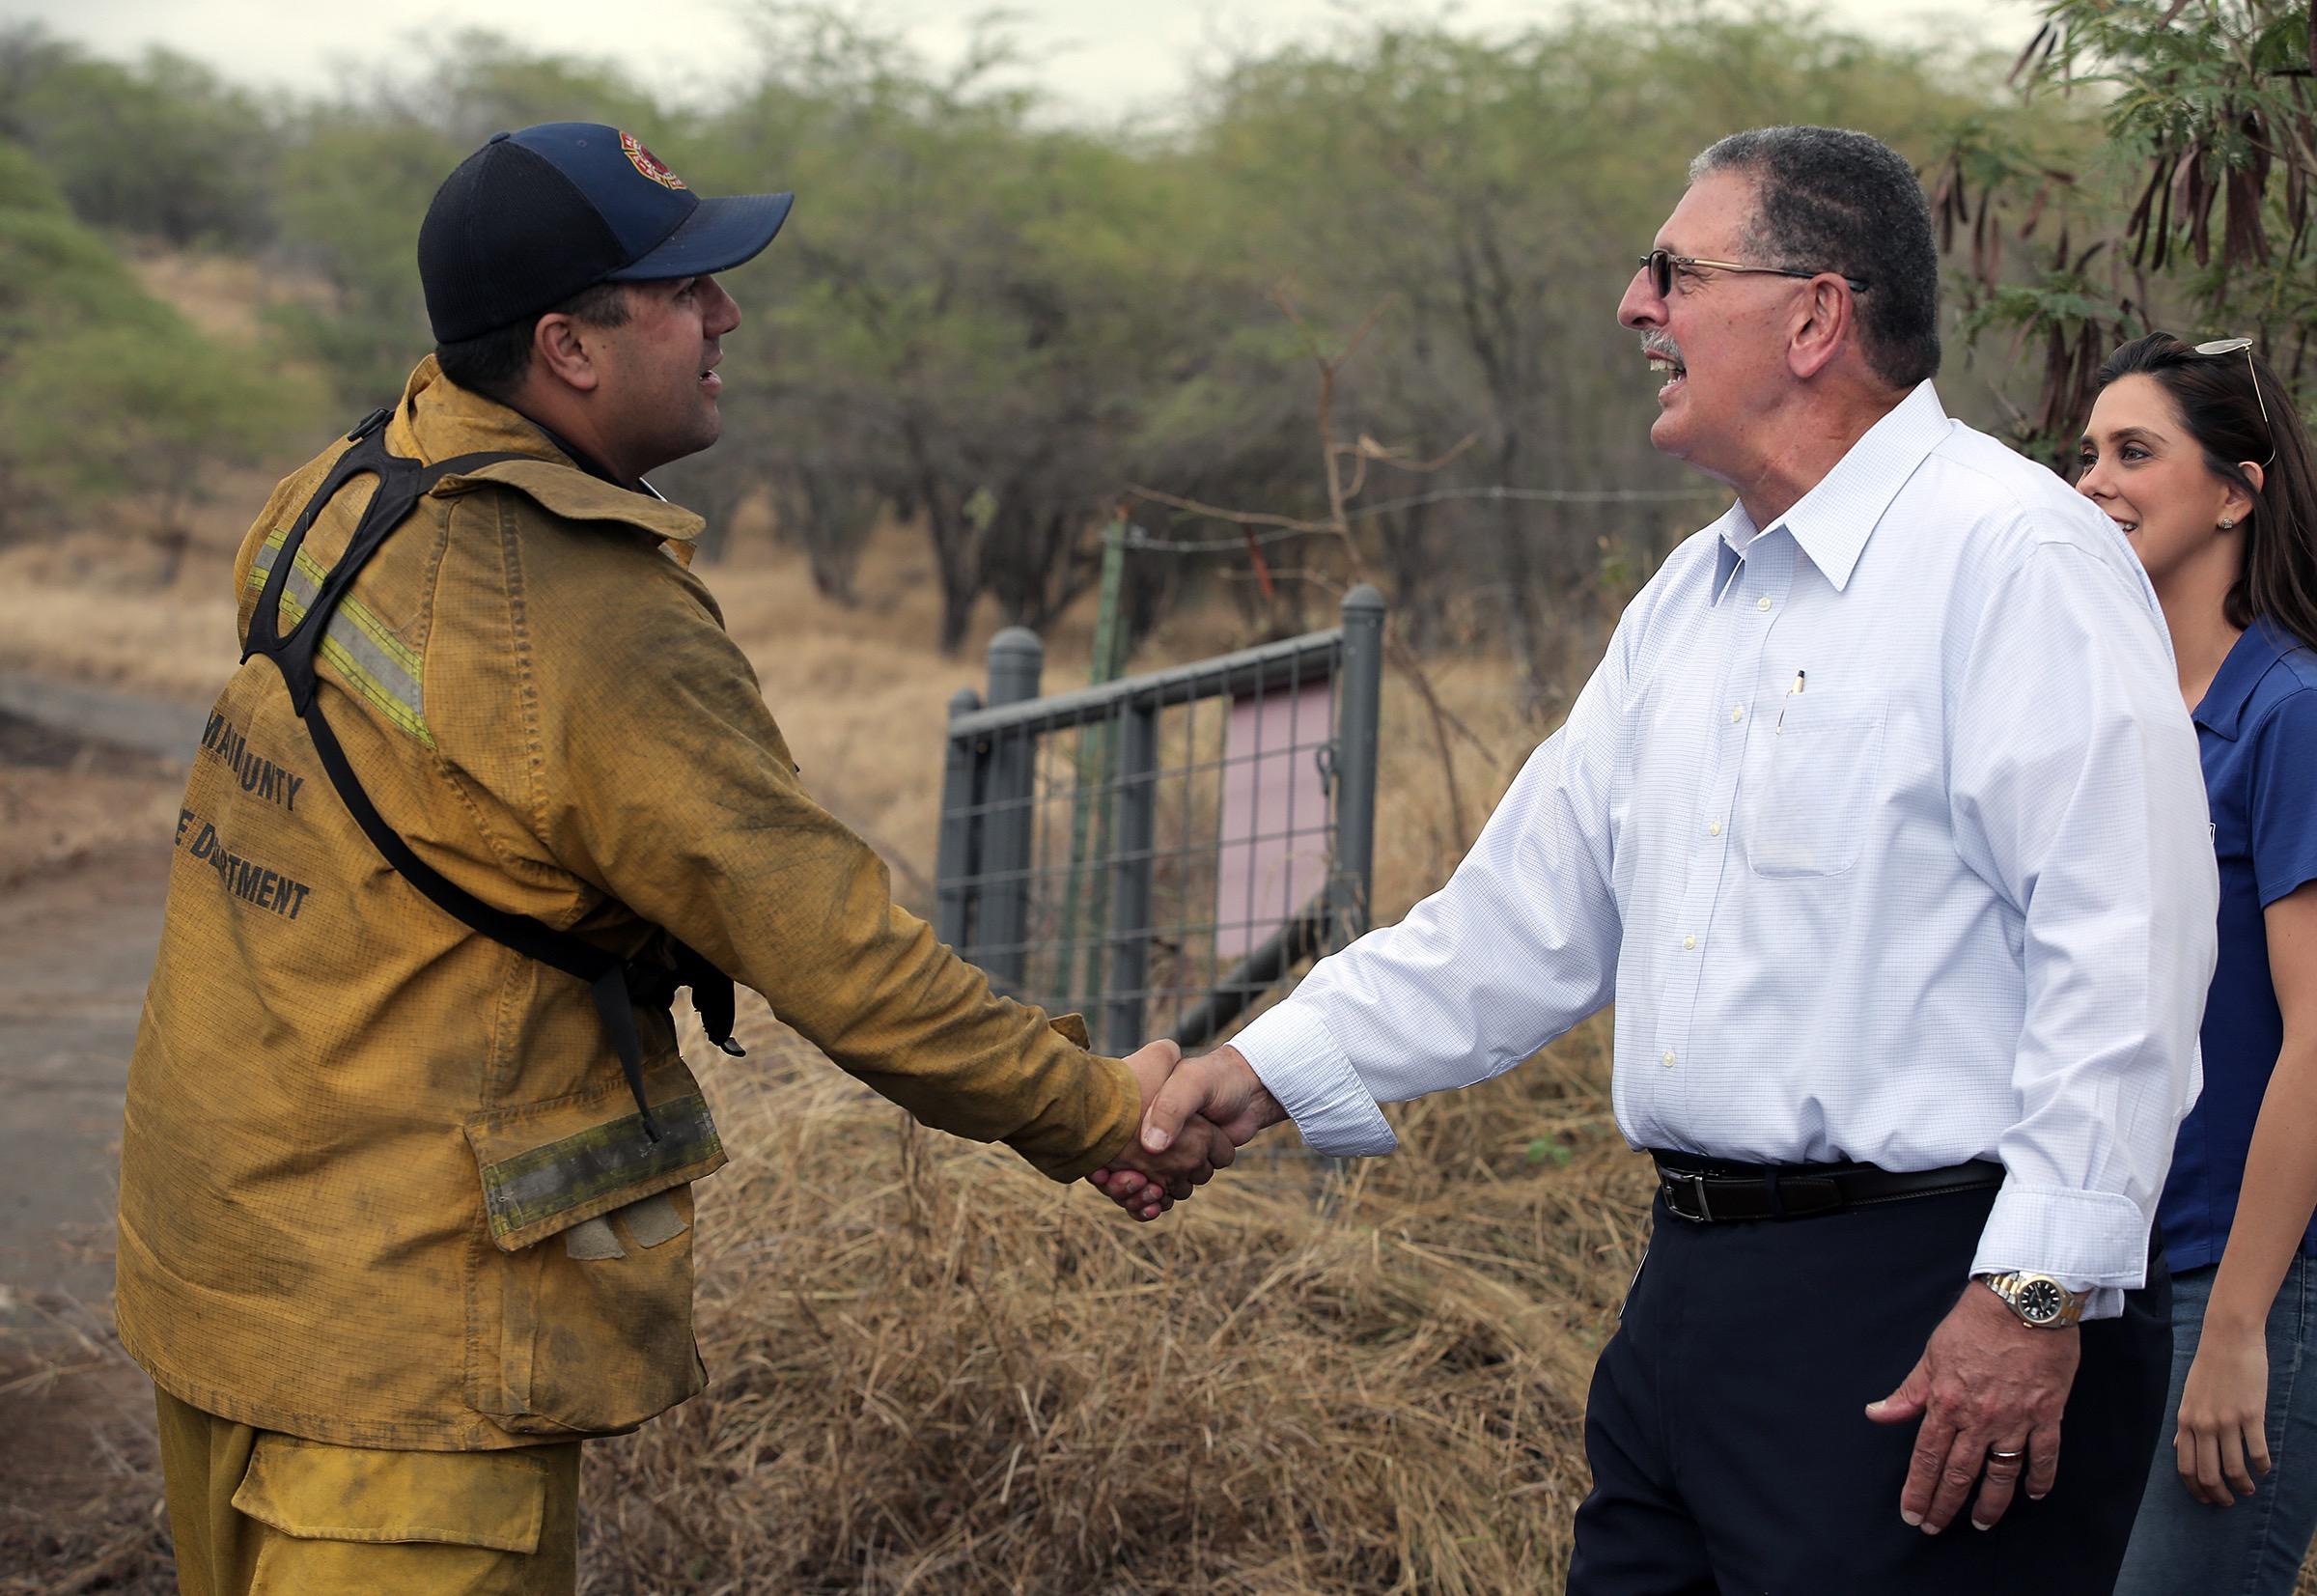 Wailea Fire 80% Contained, Mayor Inspects Scene